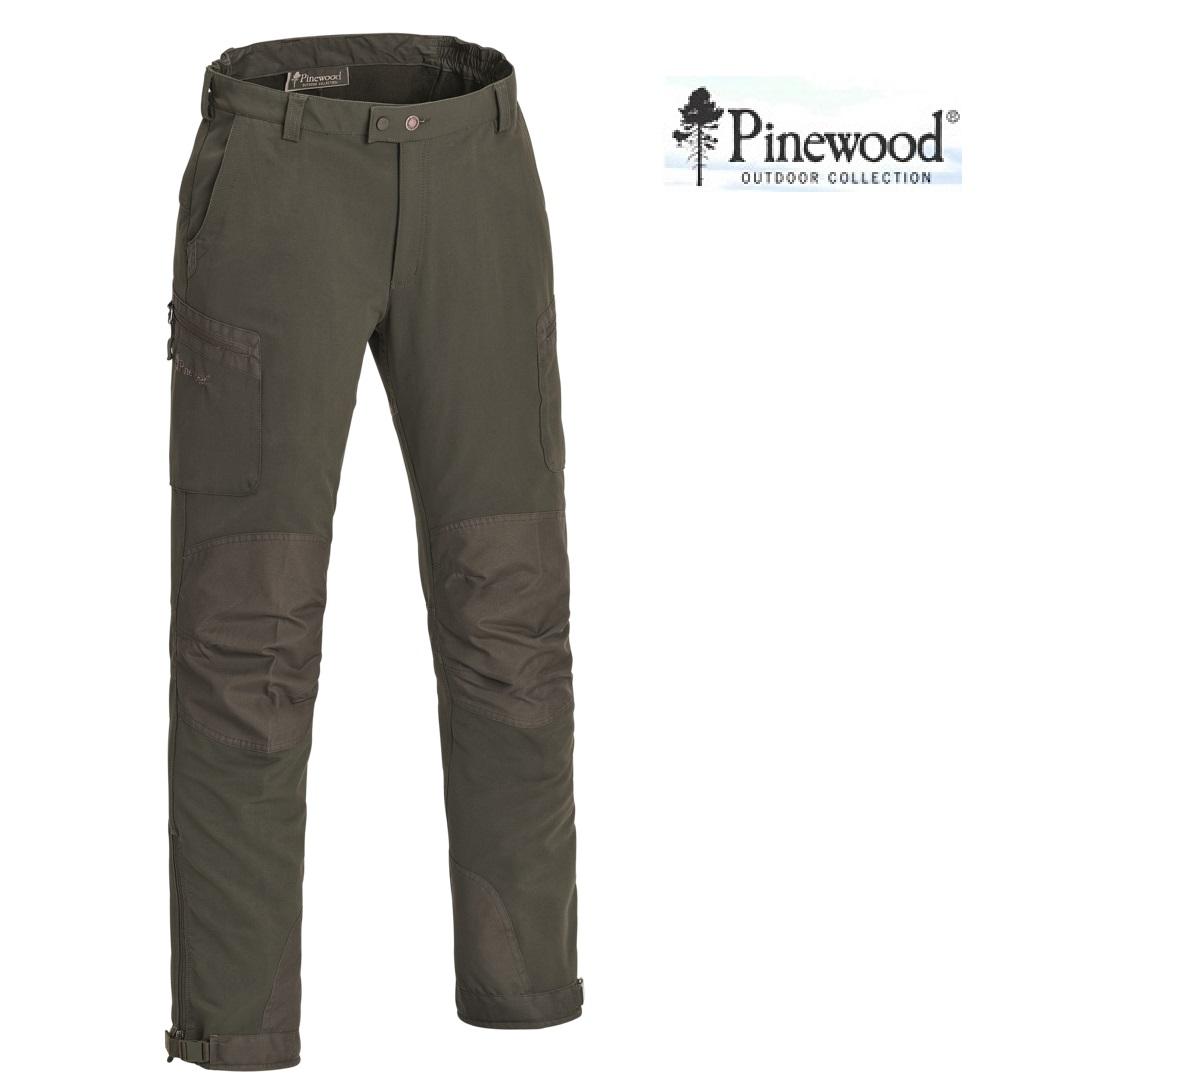 neues Design Outlet Store Verkauf harmonische Farben Pinewood Wildmark Stretch Herren Hose, Wanderhose, Outdoorhose